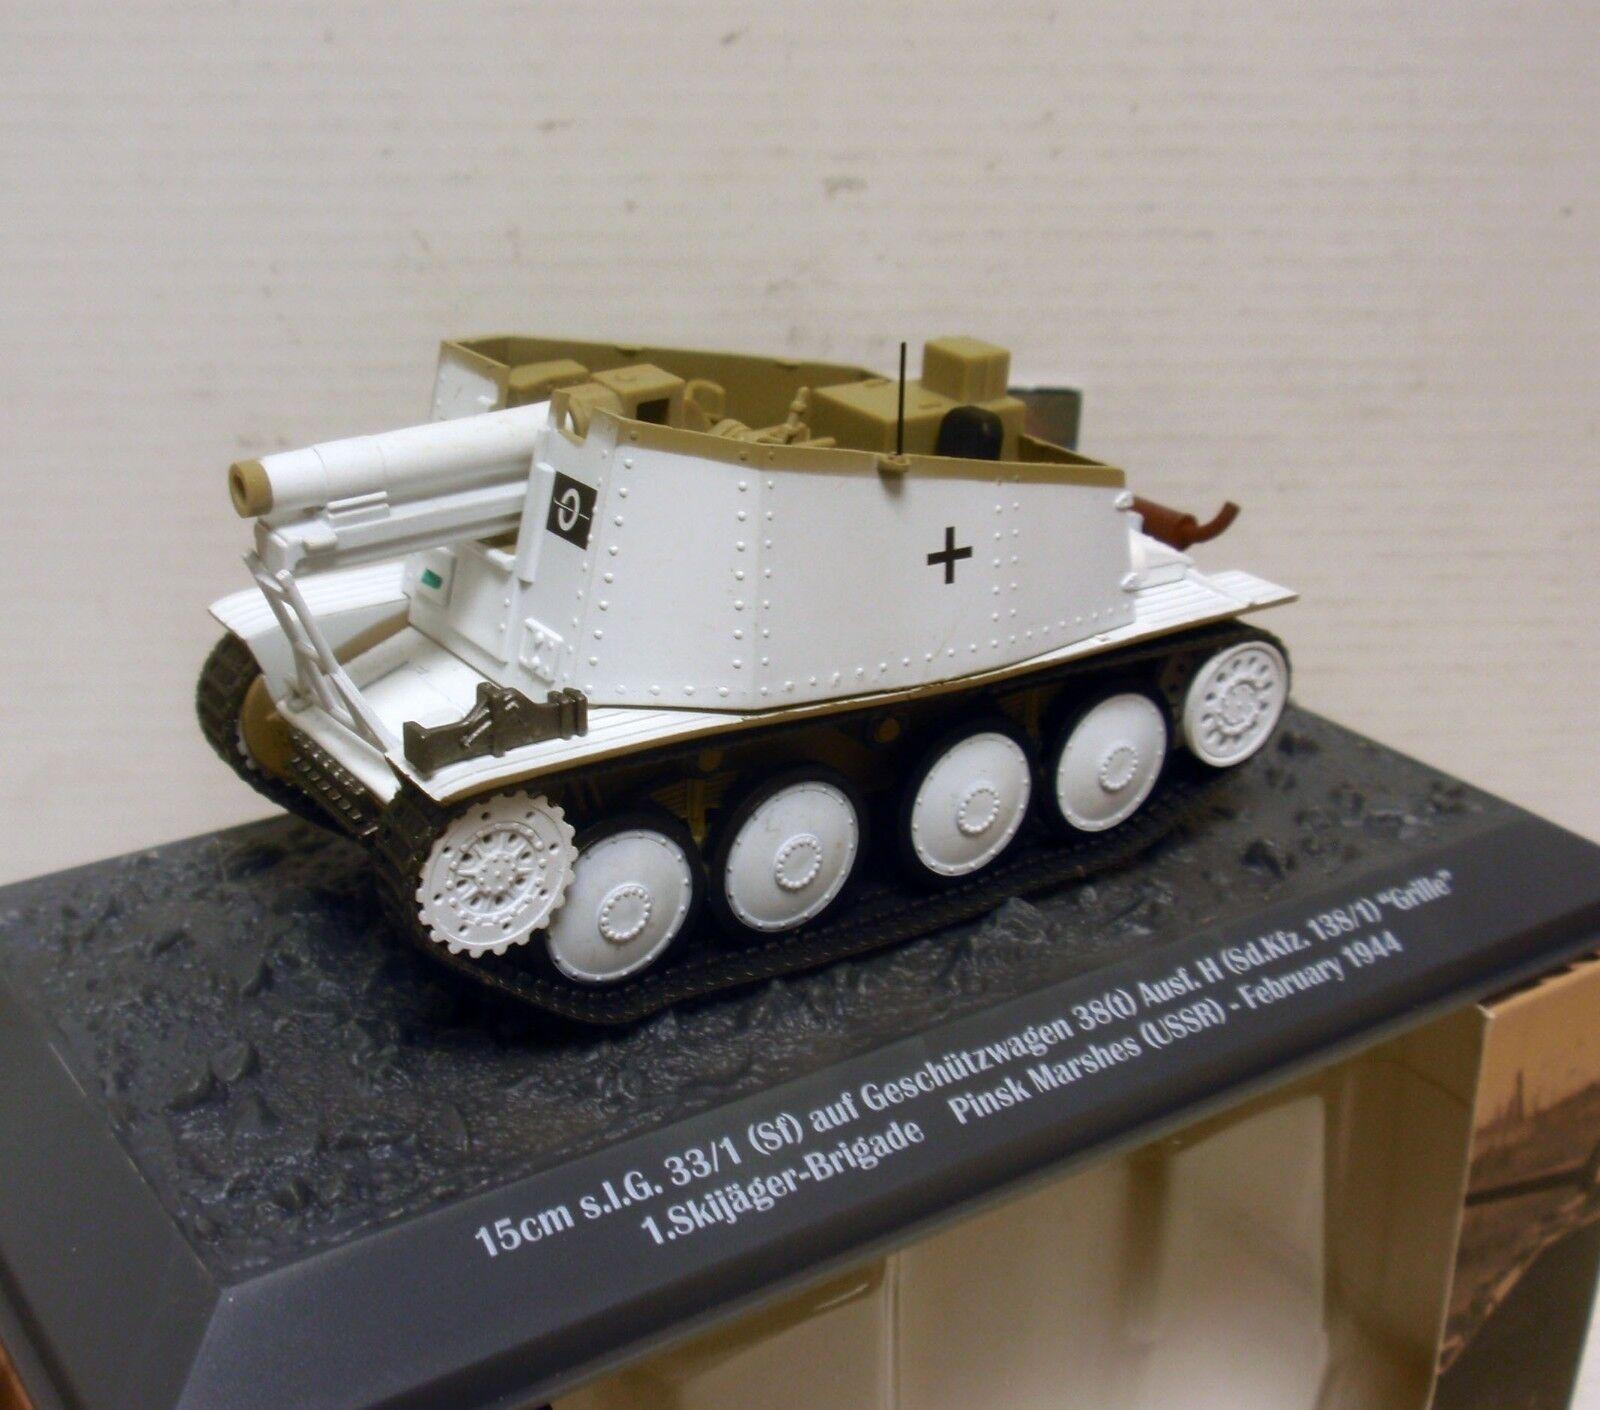 TANQUE TANK 15 cm SIG 33 1 138 1 GRILLE SKIJAGER PINSK MARSHES 1944 1 43 ALTAYA